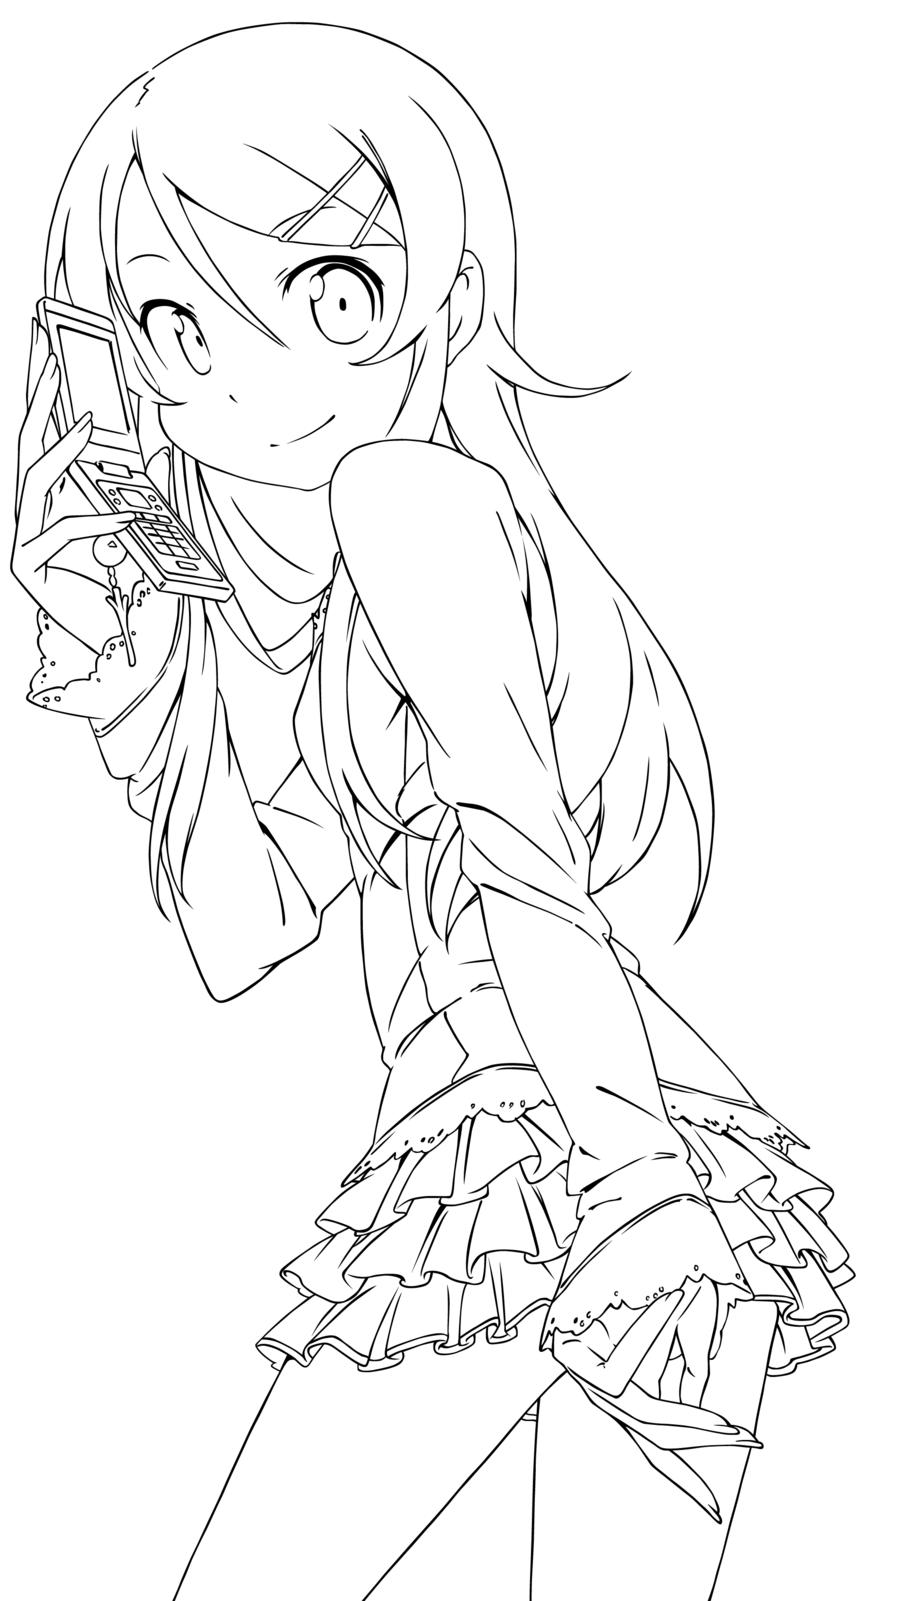 Kirino Kousaka Lineart Coloring Pages Anime Lineart Cute Coloring Pages